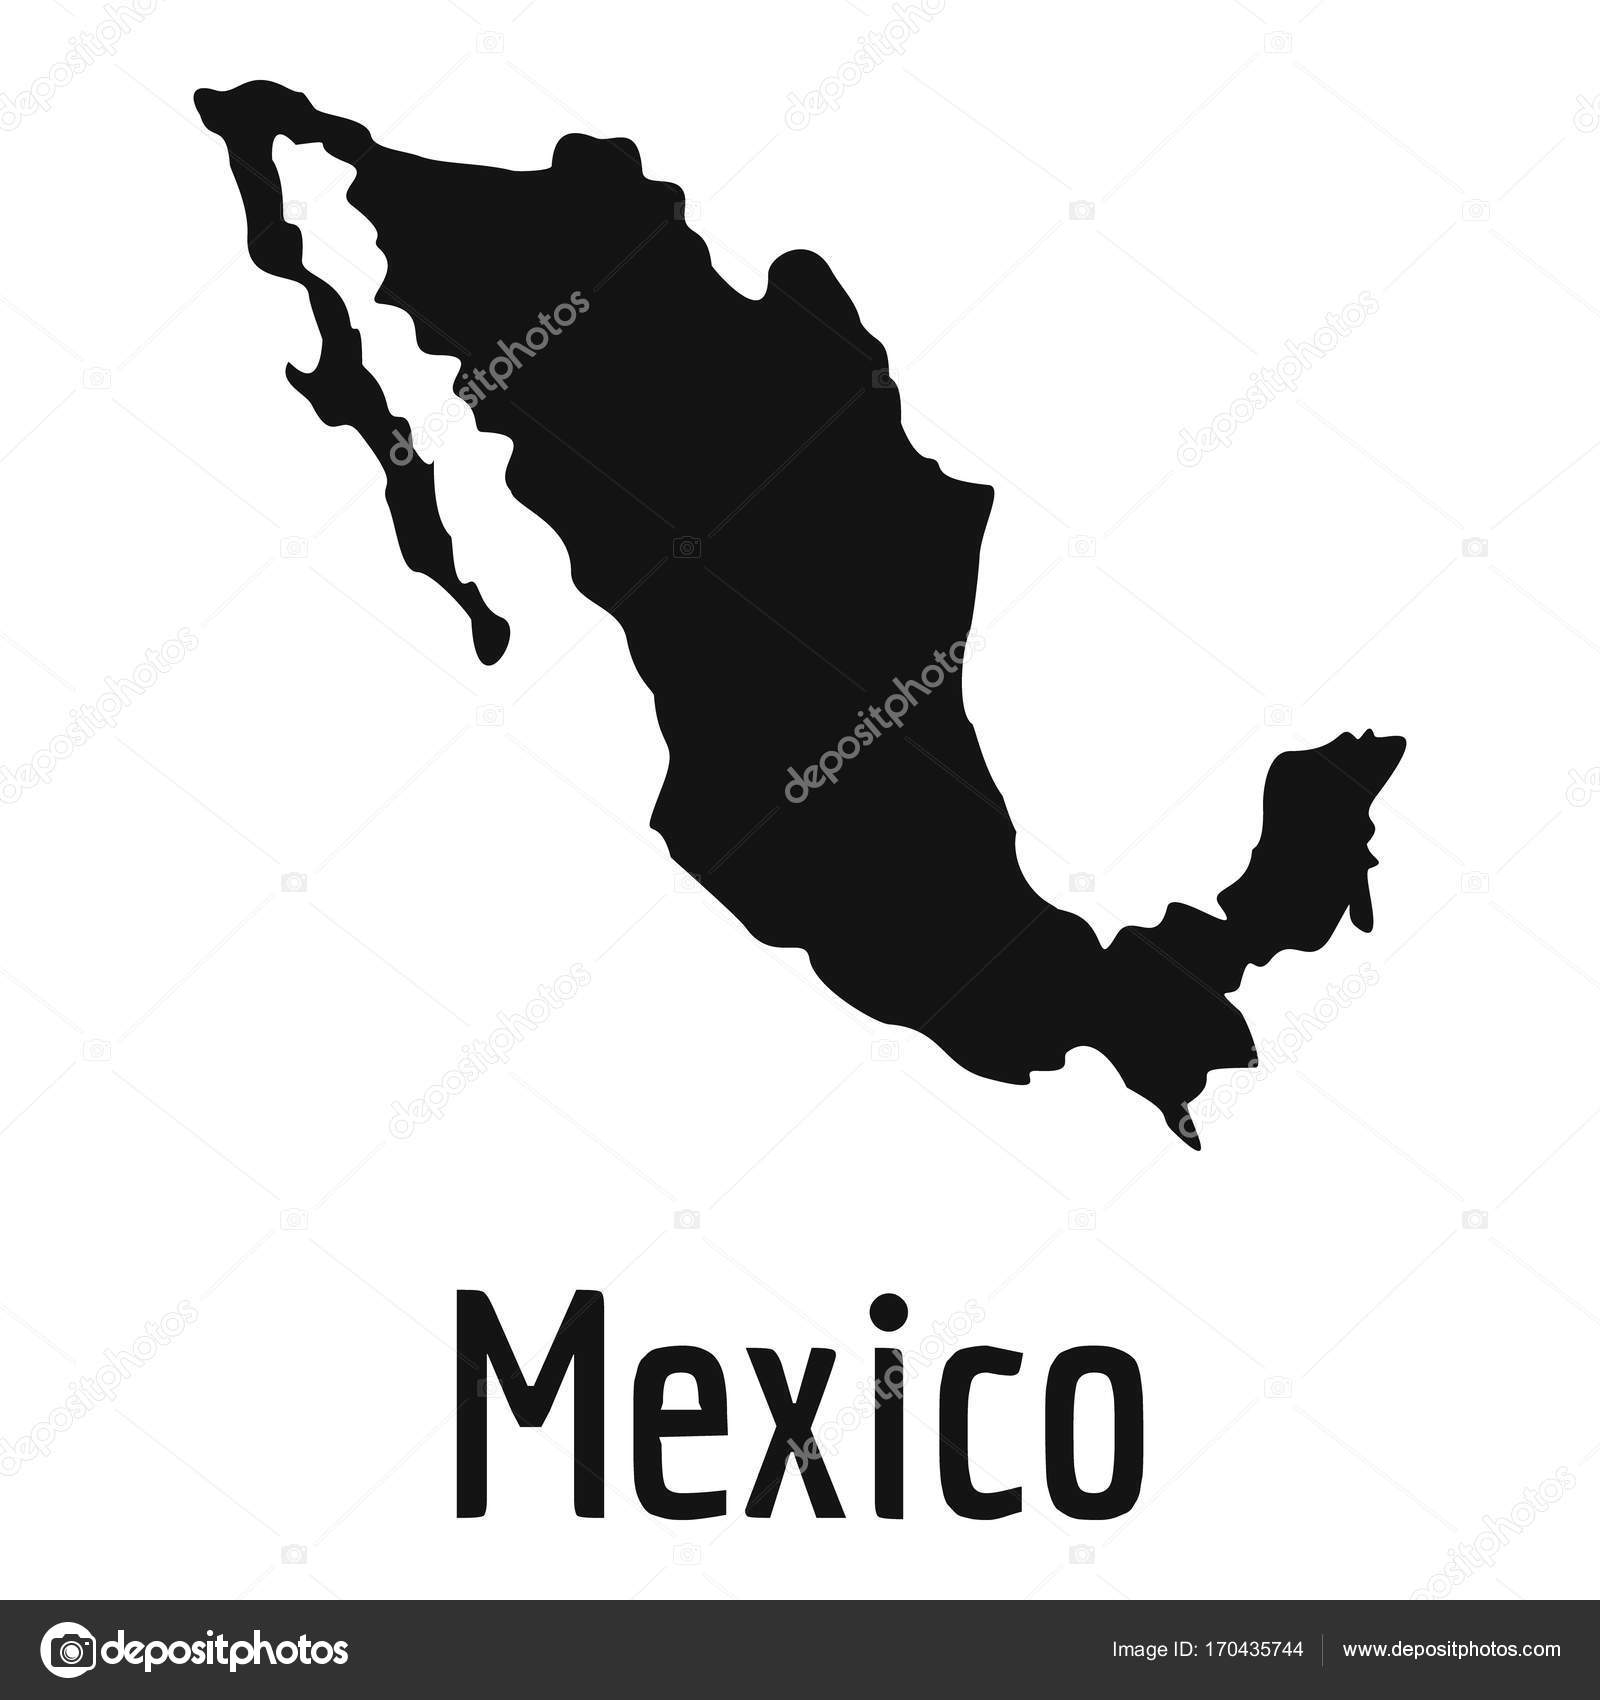 Mexico Map In Black Vector Simple Stock Vector C Anatolir 170435744